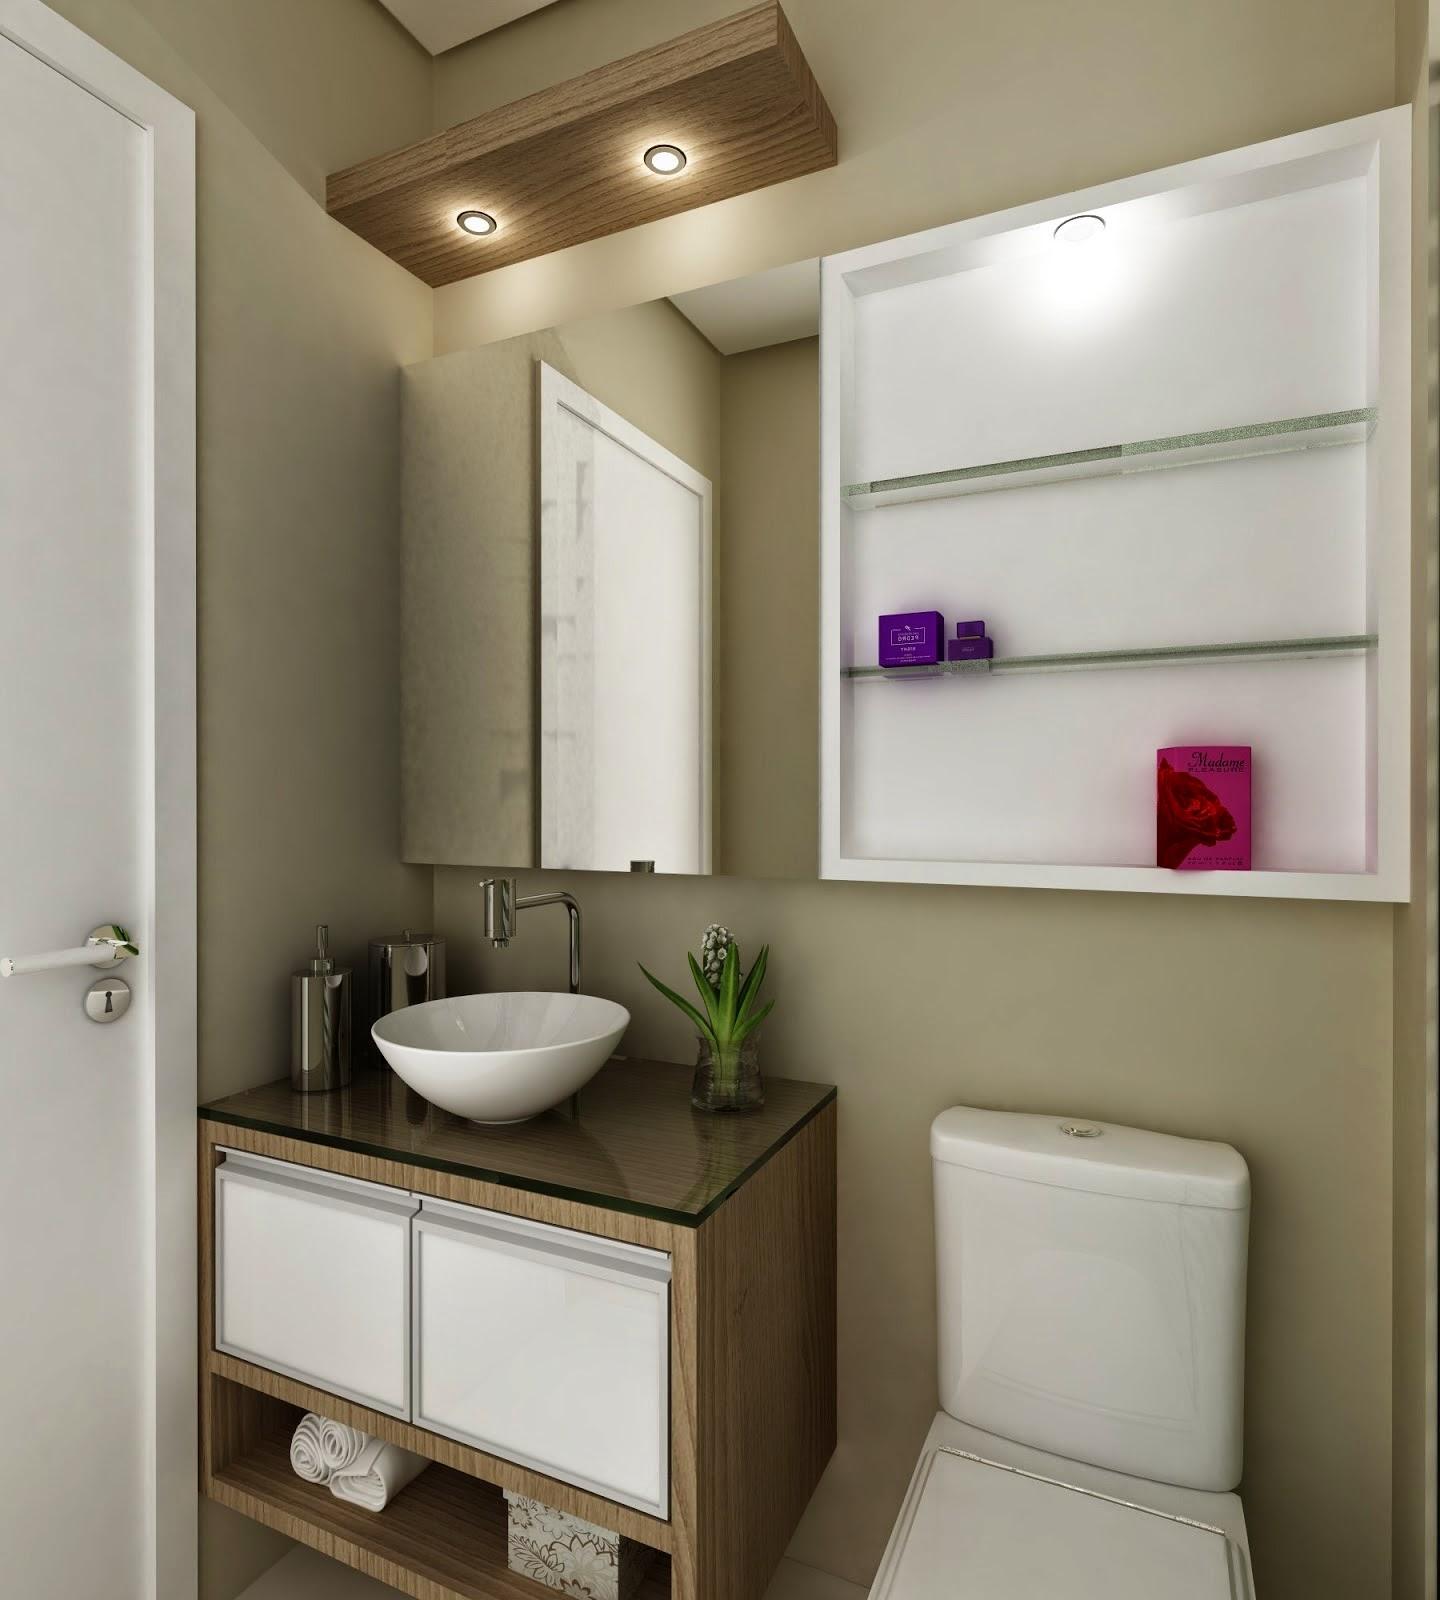 Pia De Banheiro Branco Itaunas, Pia De Banheiro Com Armario, Pia De Banheiro  -> Armario Banheiro Mofo